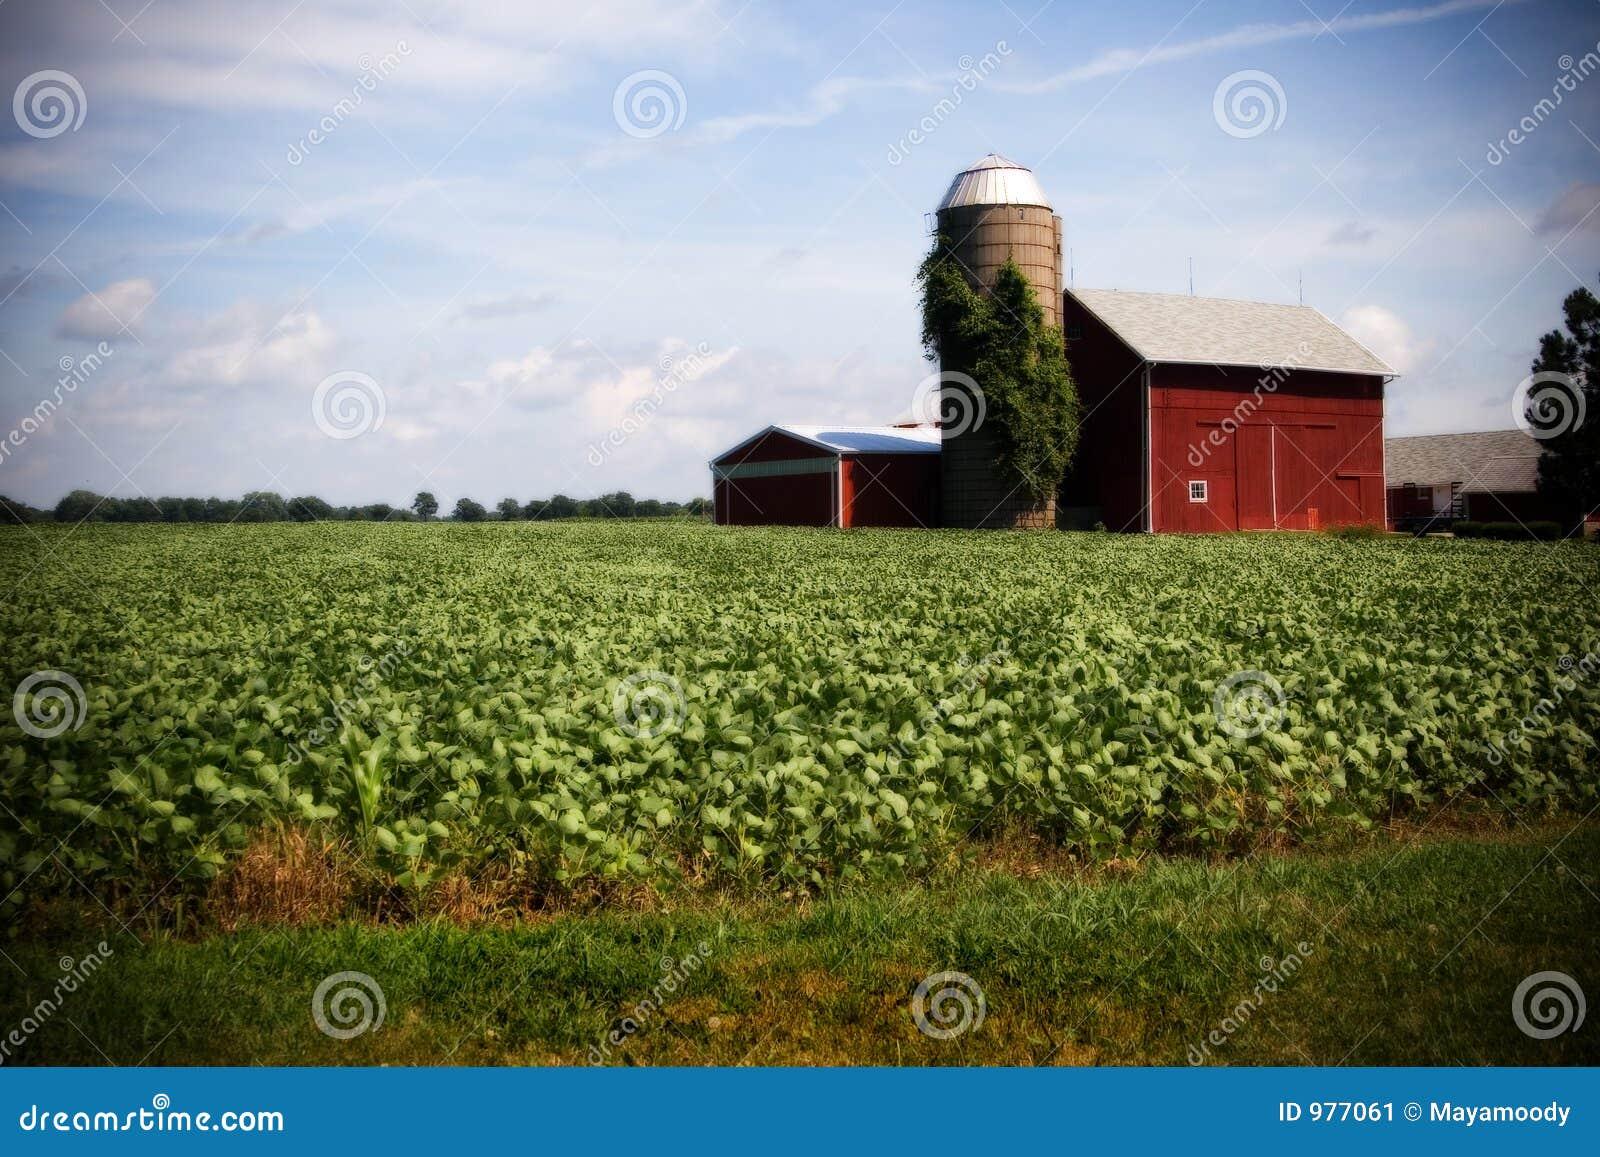 Illinois Farm Stock Image Image 977061